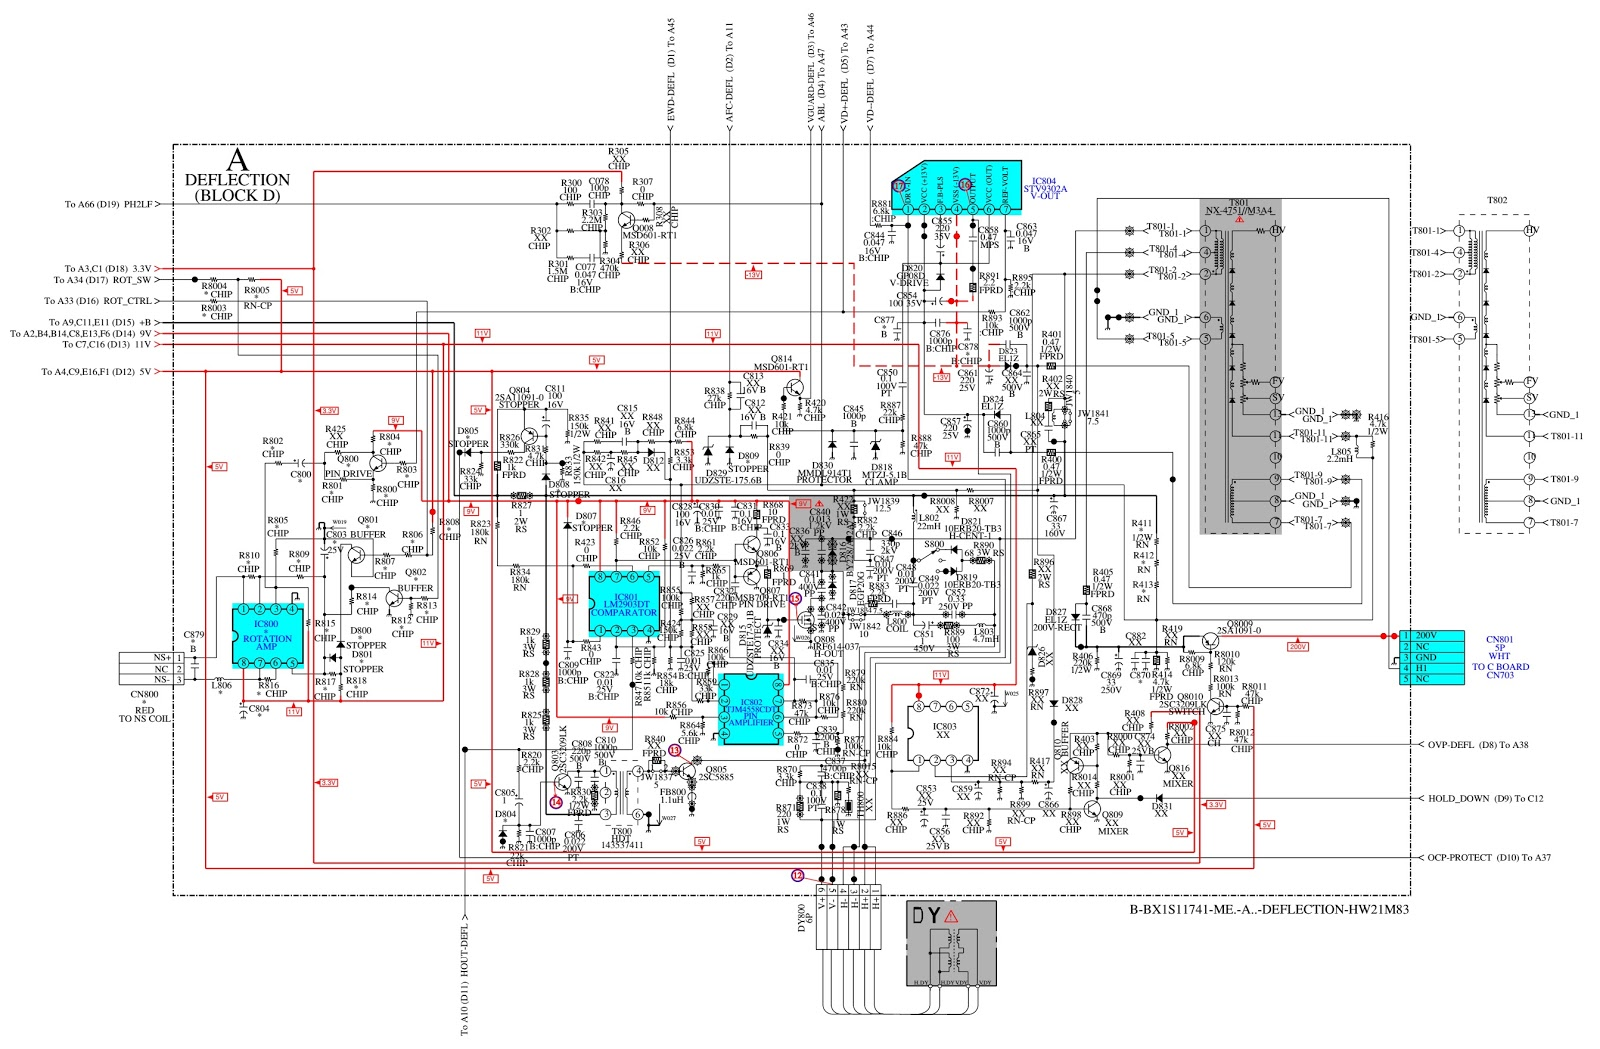 tv tuner card circuit diagram sears kenmore refrigerator parts kv hw21m50  sony trinitron crt